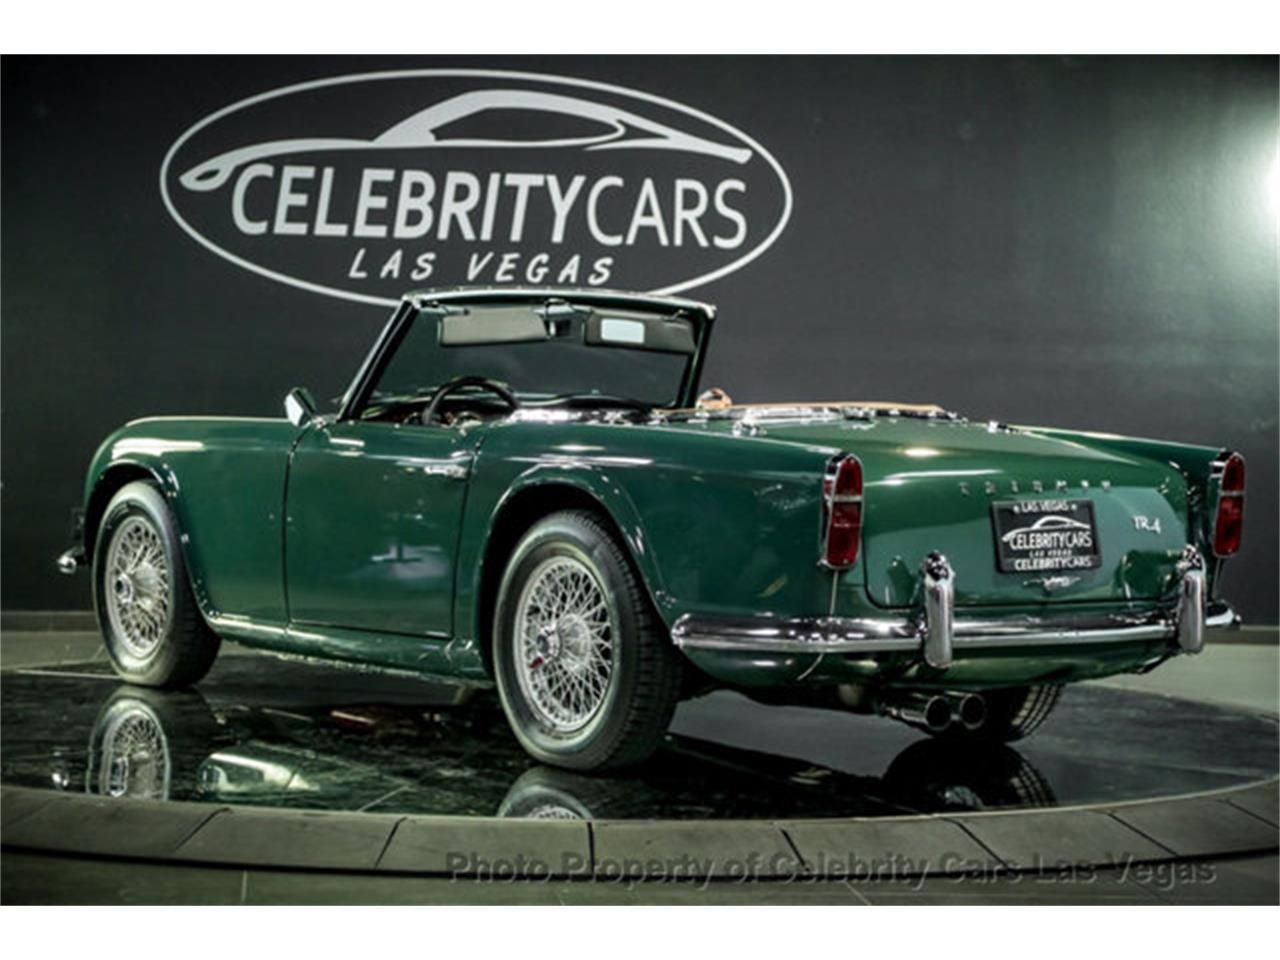 1965 Triumph TR4 for sale in Las Vegas, NV / ClassicCarsBay com